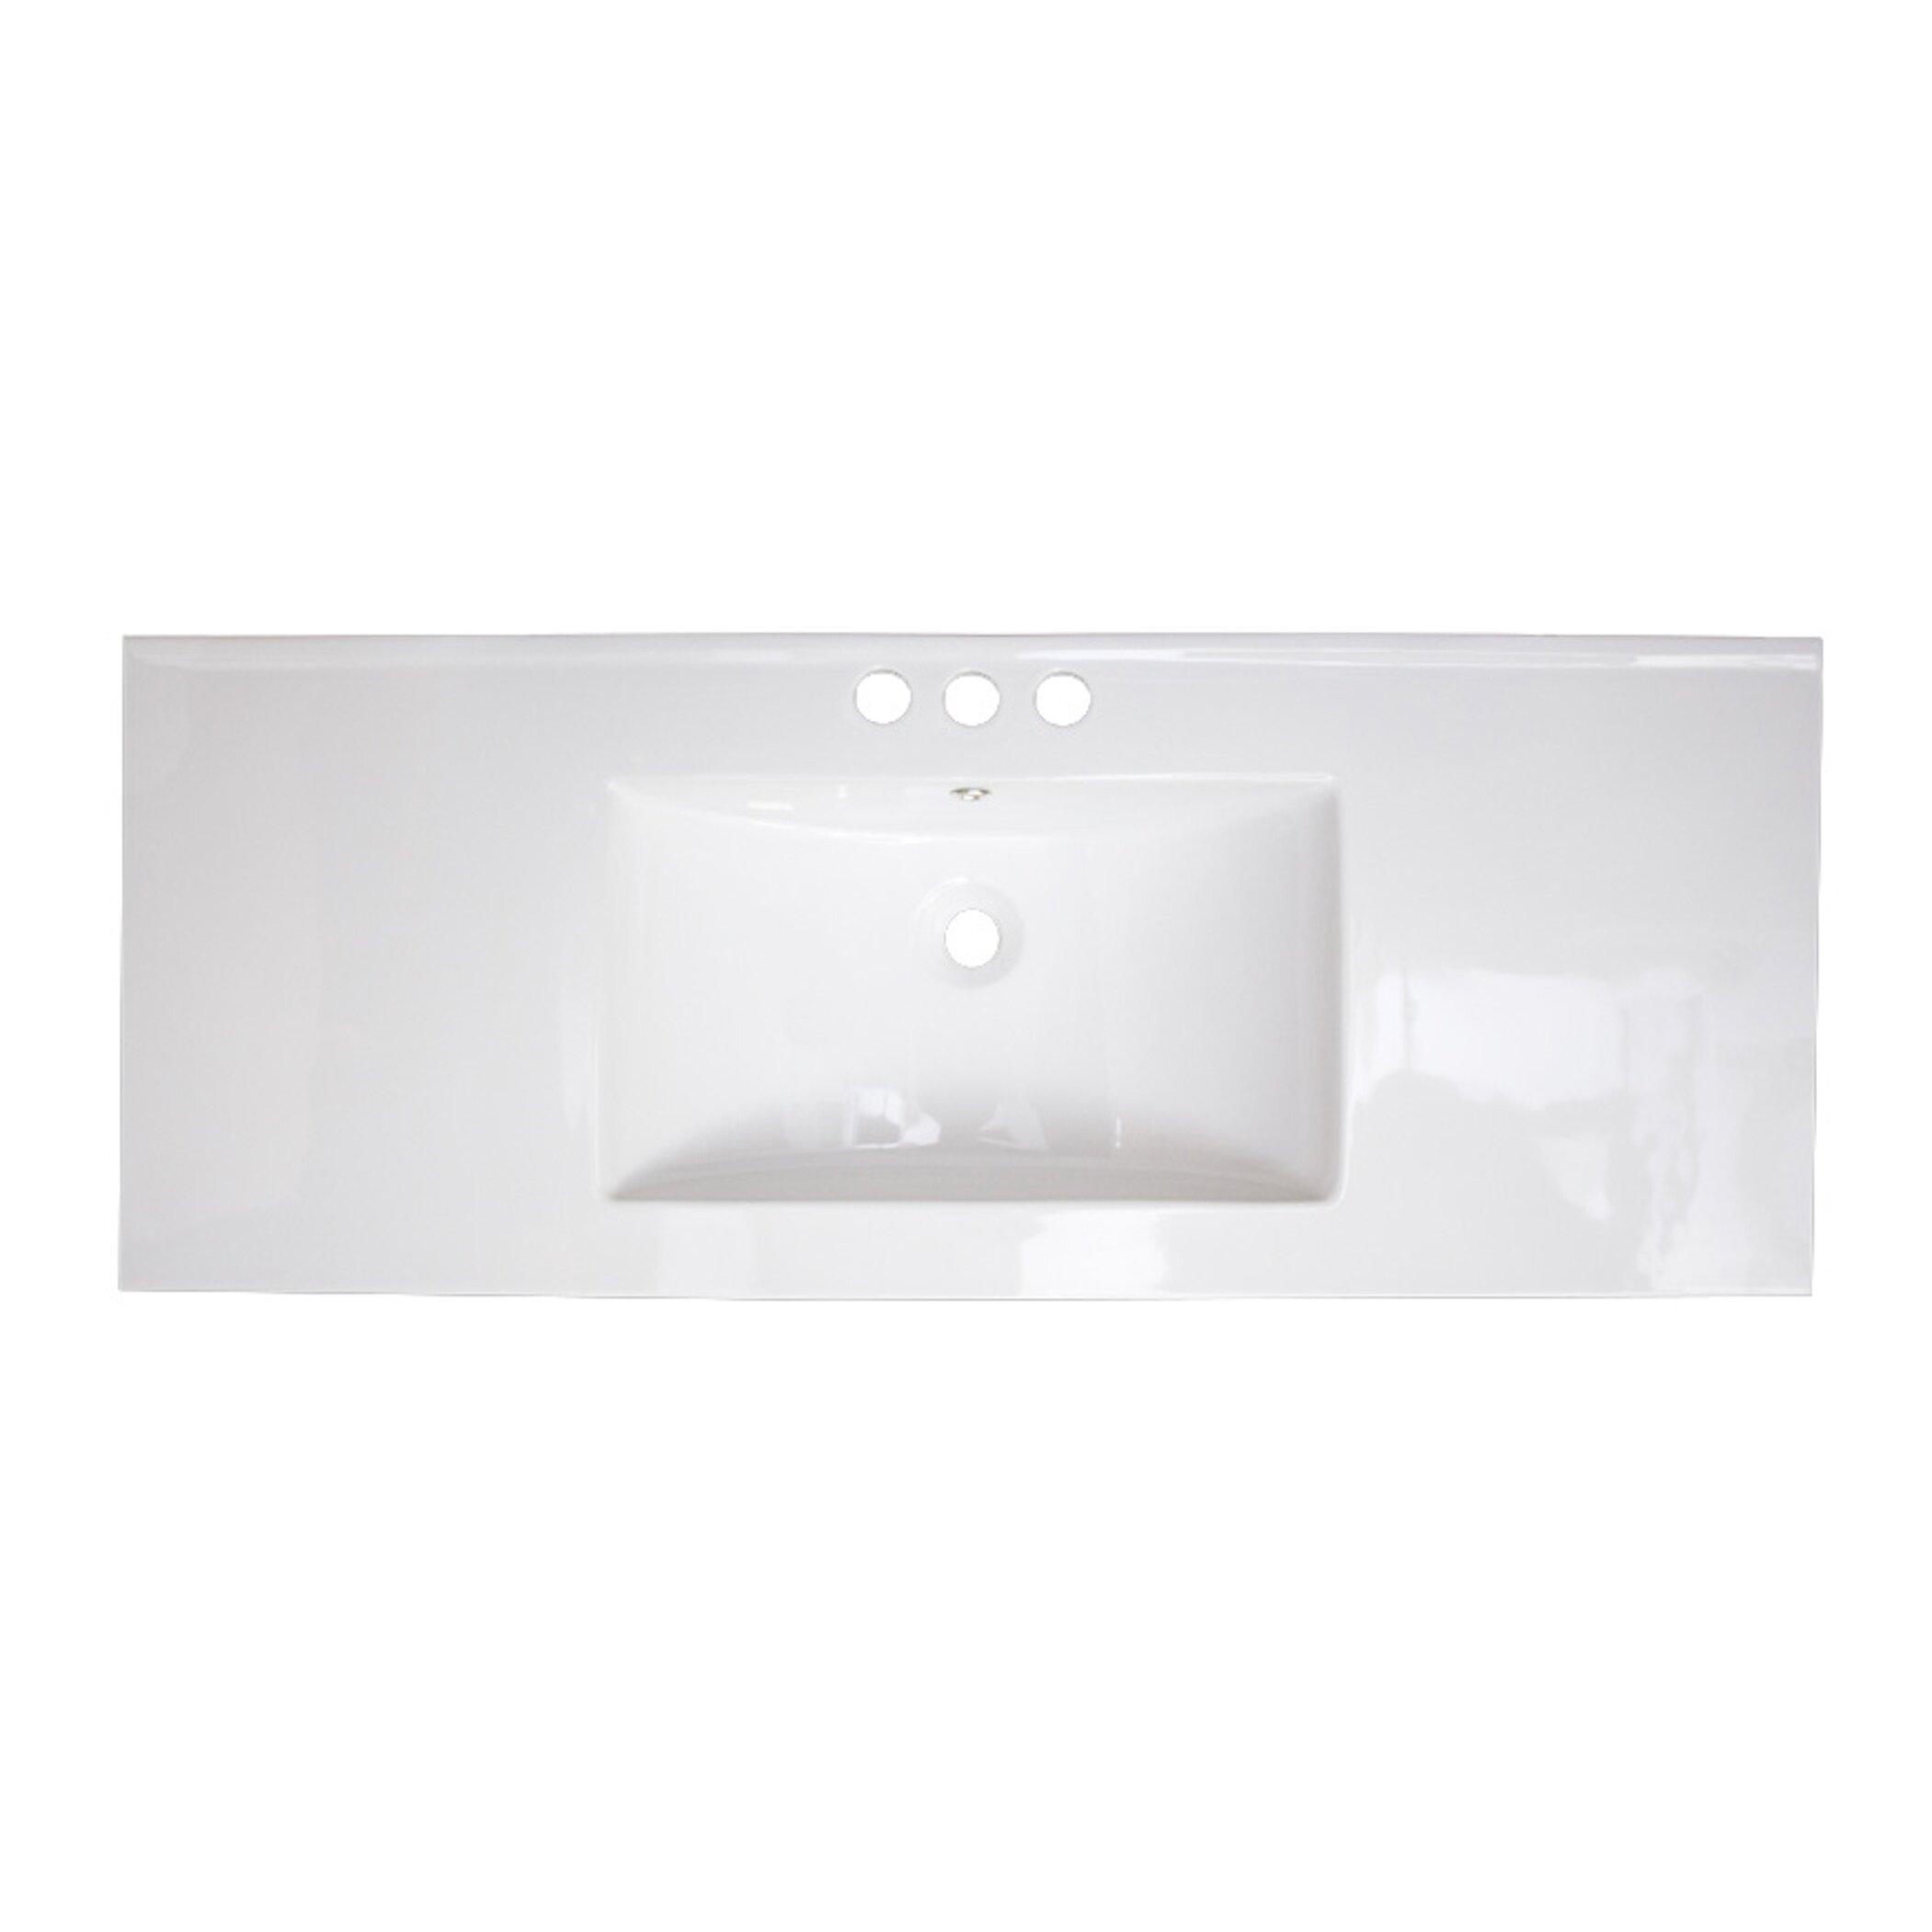 48quot; Ceramic Bathroom Vanity Top by American Imaginations